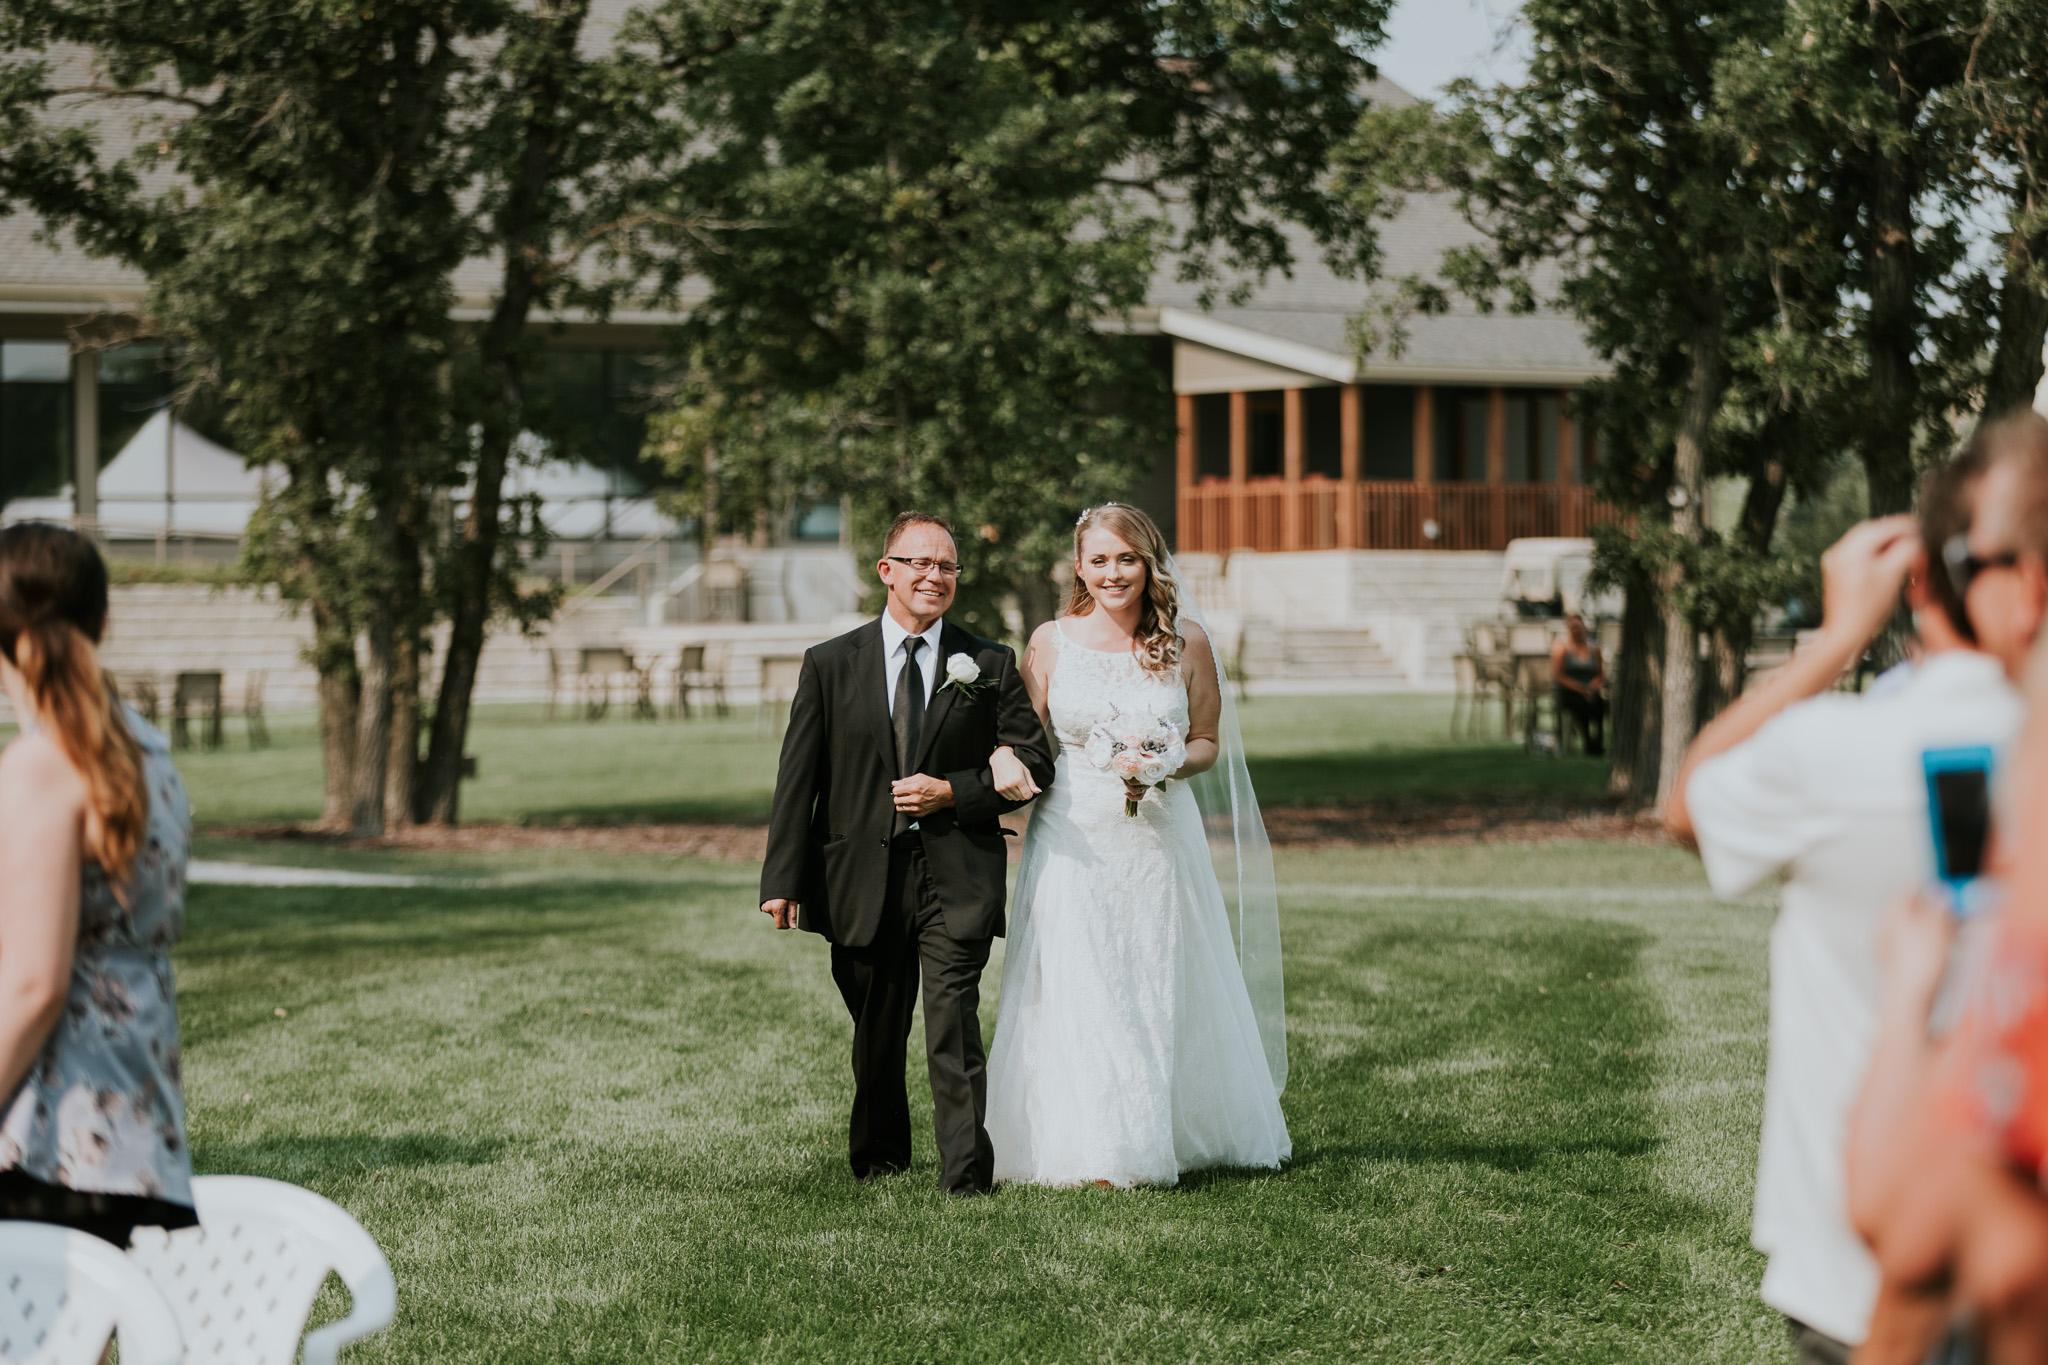 southwood-golf-course-wedding-winnipeg-50.jpg